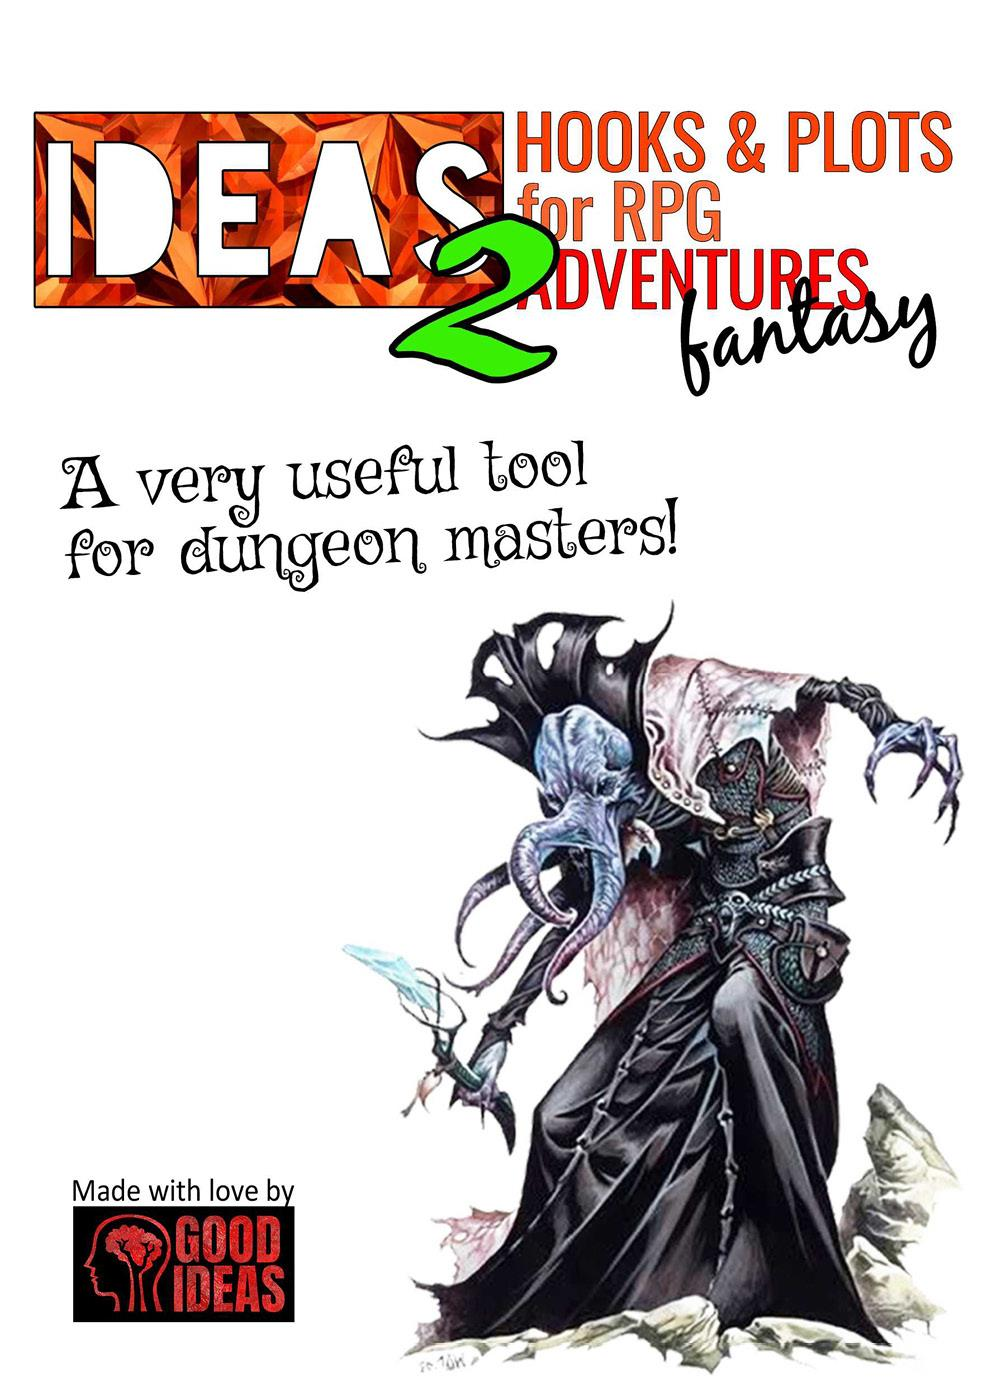 IDEAS!2 Hooks & Plots for RPG fantasy adventureses